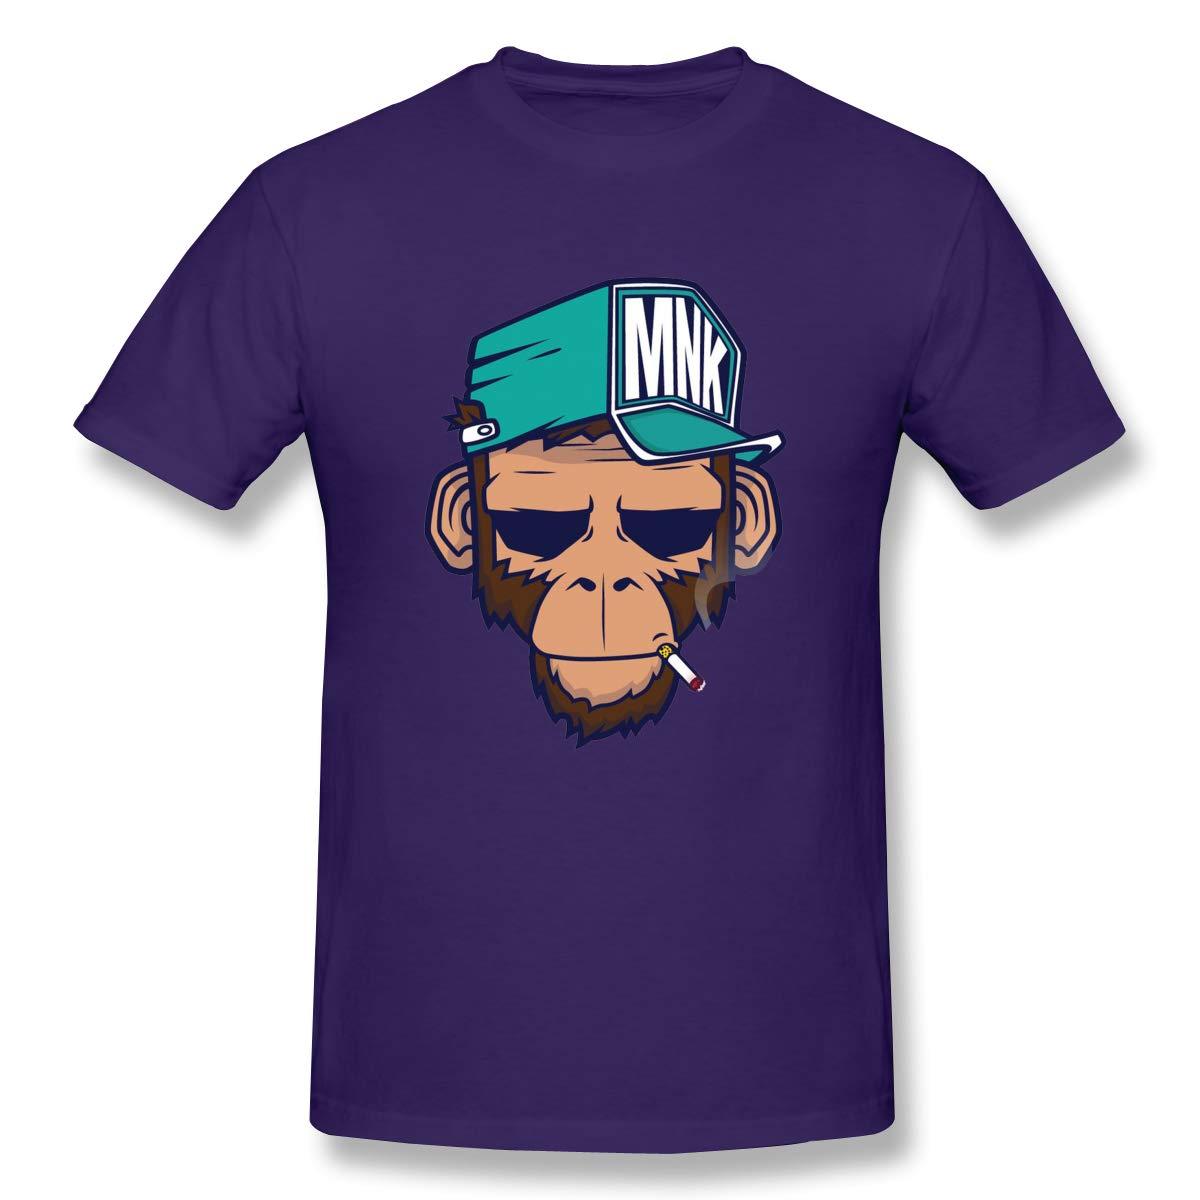 Hewtrf Gorilla Monkey Smoking A Bad Monkey Leisure And Fun Pure Purple 6 Short Sleeve Tshi